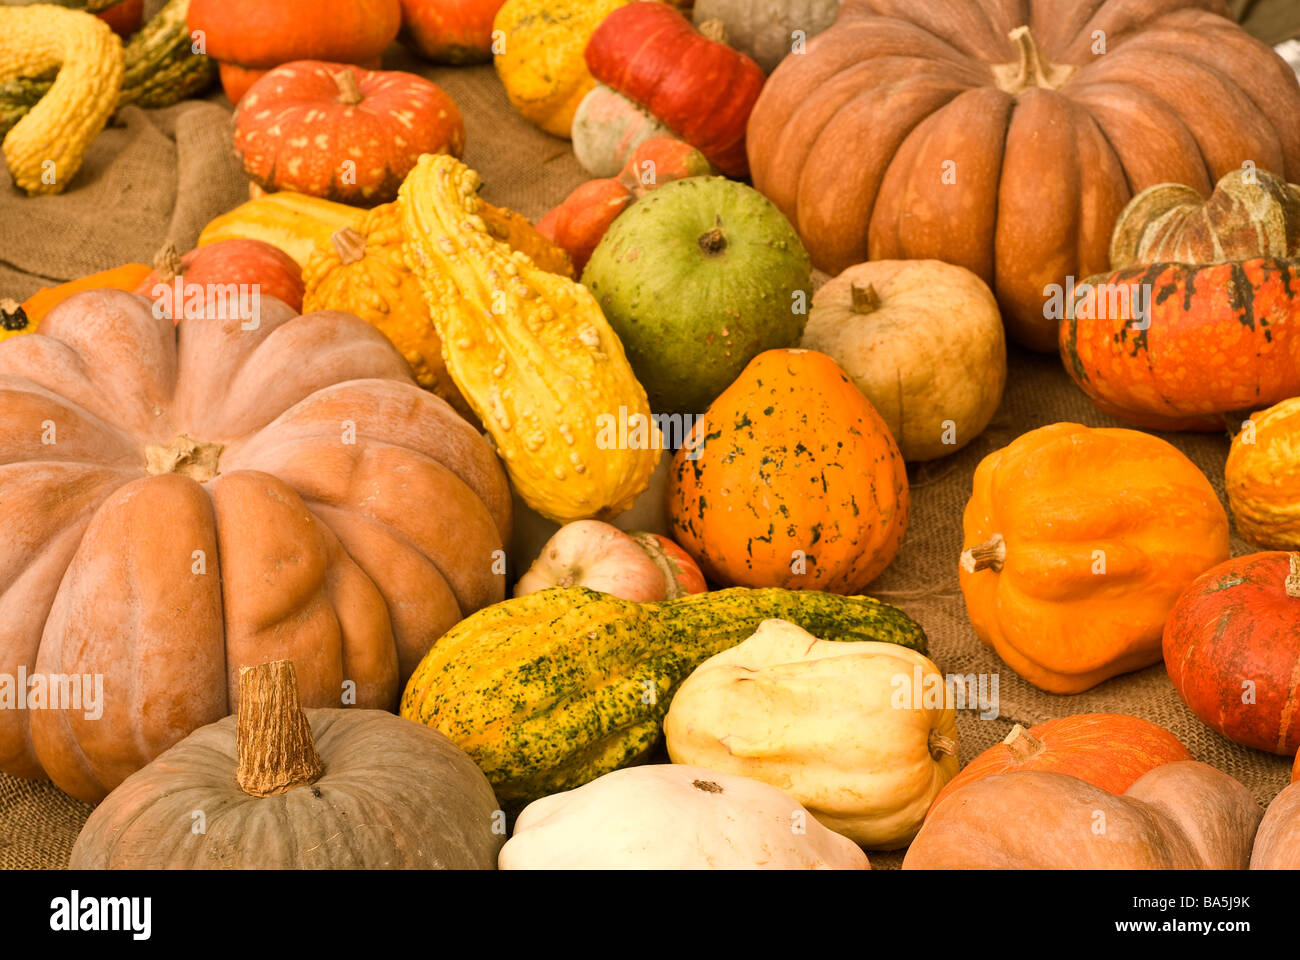 Pumpkins gourd-like squash of the genus Cucurbita - Stock Image